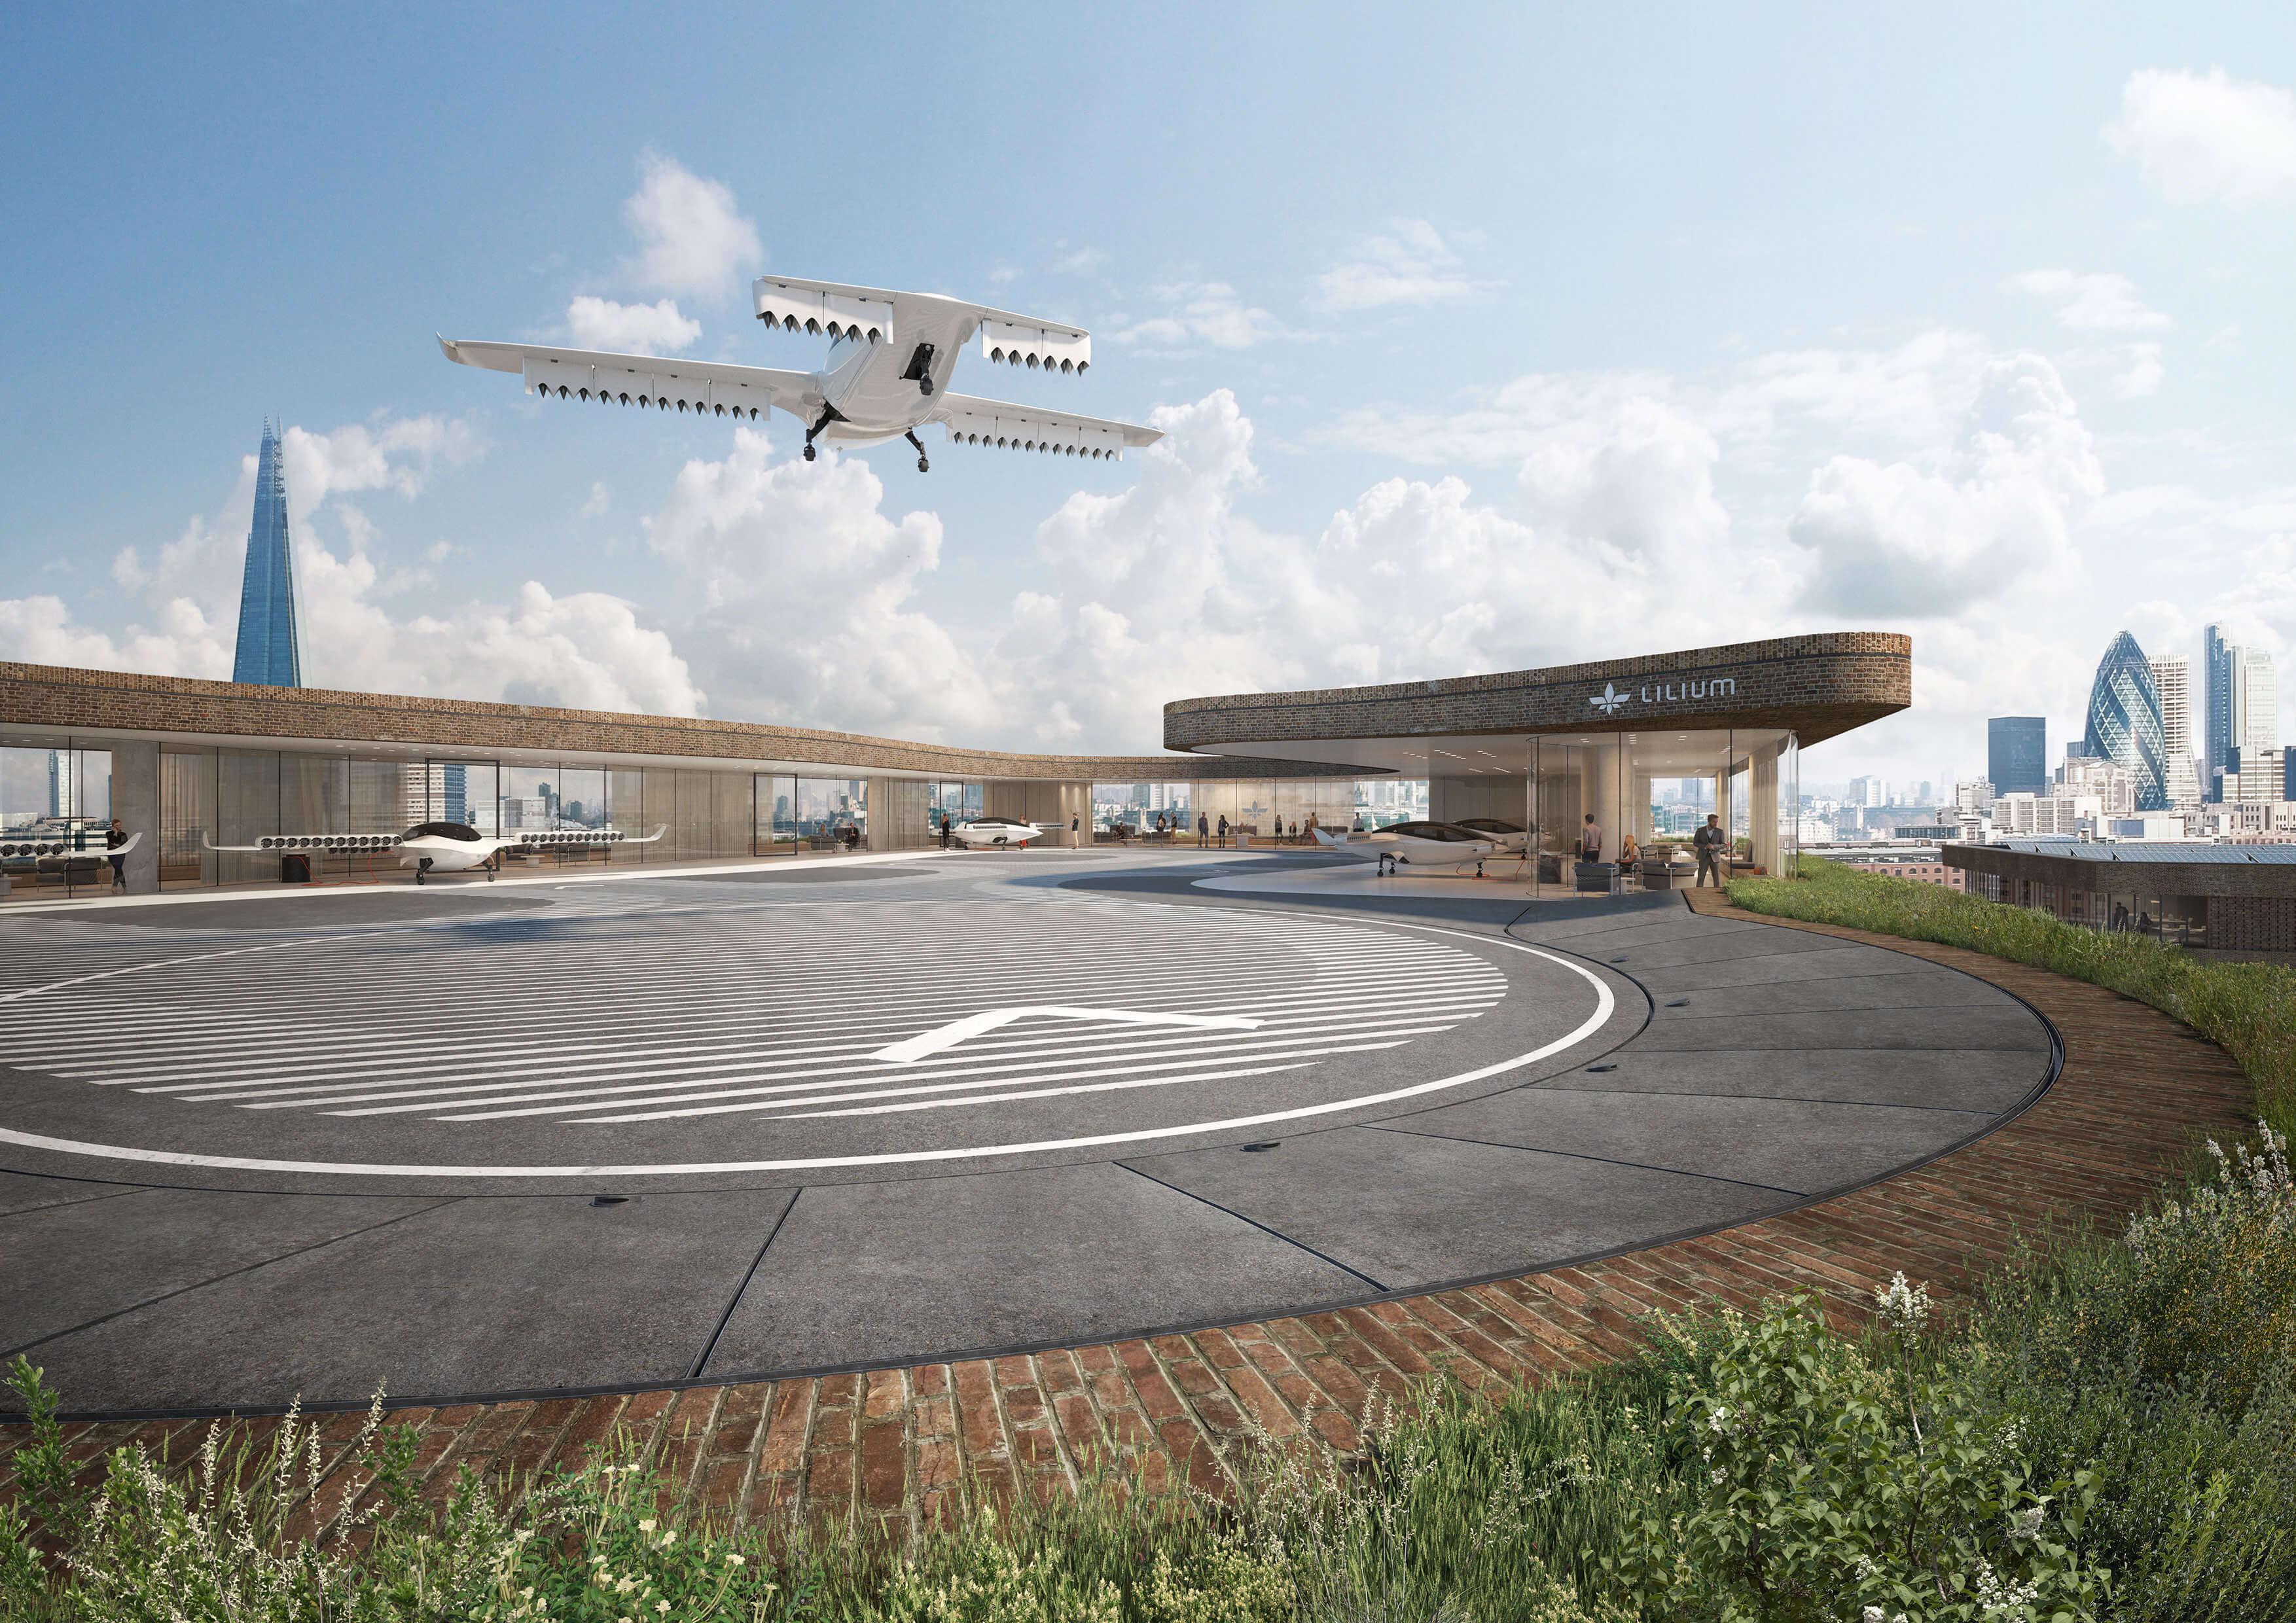 Lilium_FO004_air-taxi-service-landing-pad_screen